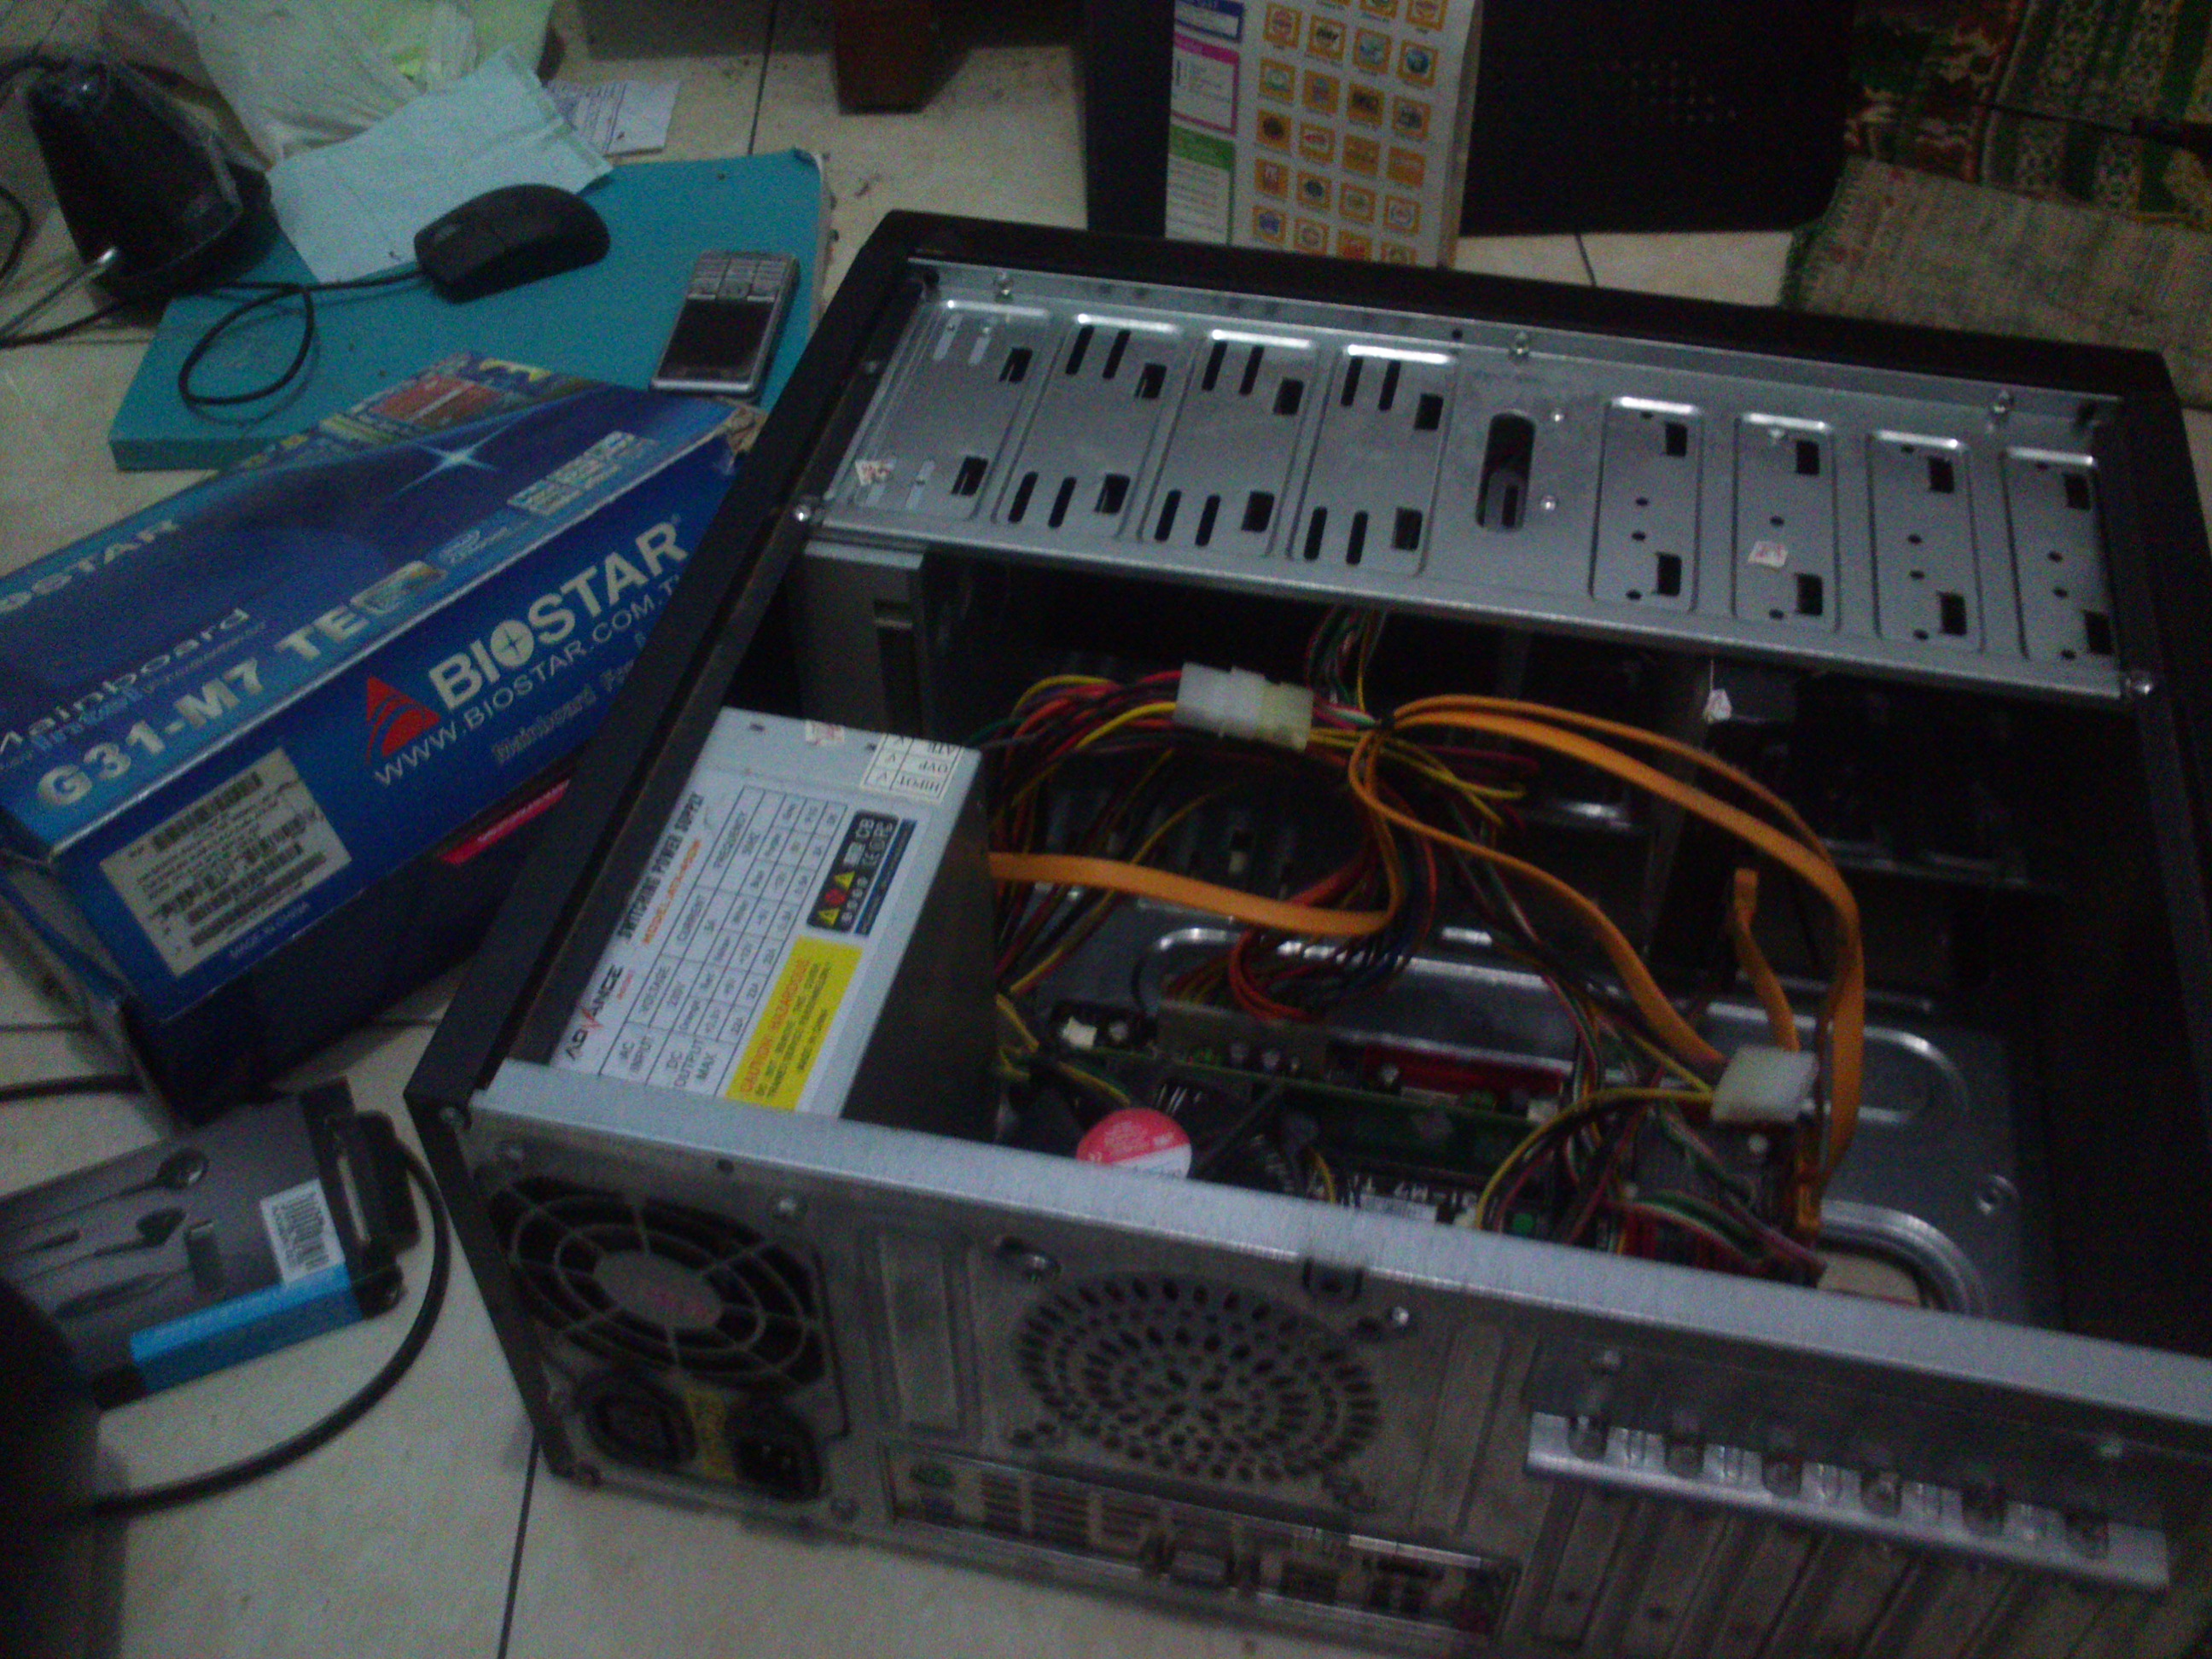 Restorasi Komputer Butut Teman Socket Lga 775 Intel Core Duo Mainboard Buildup Ddr3 Dsc 0798